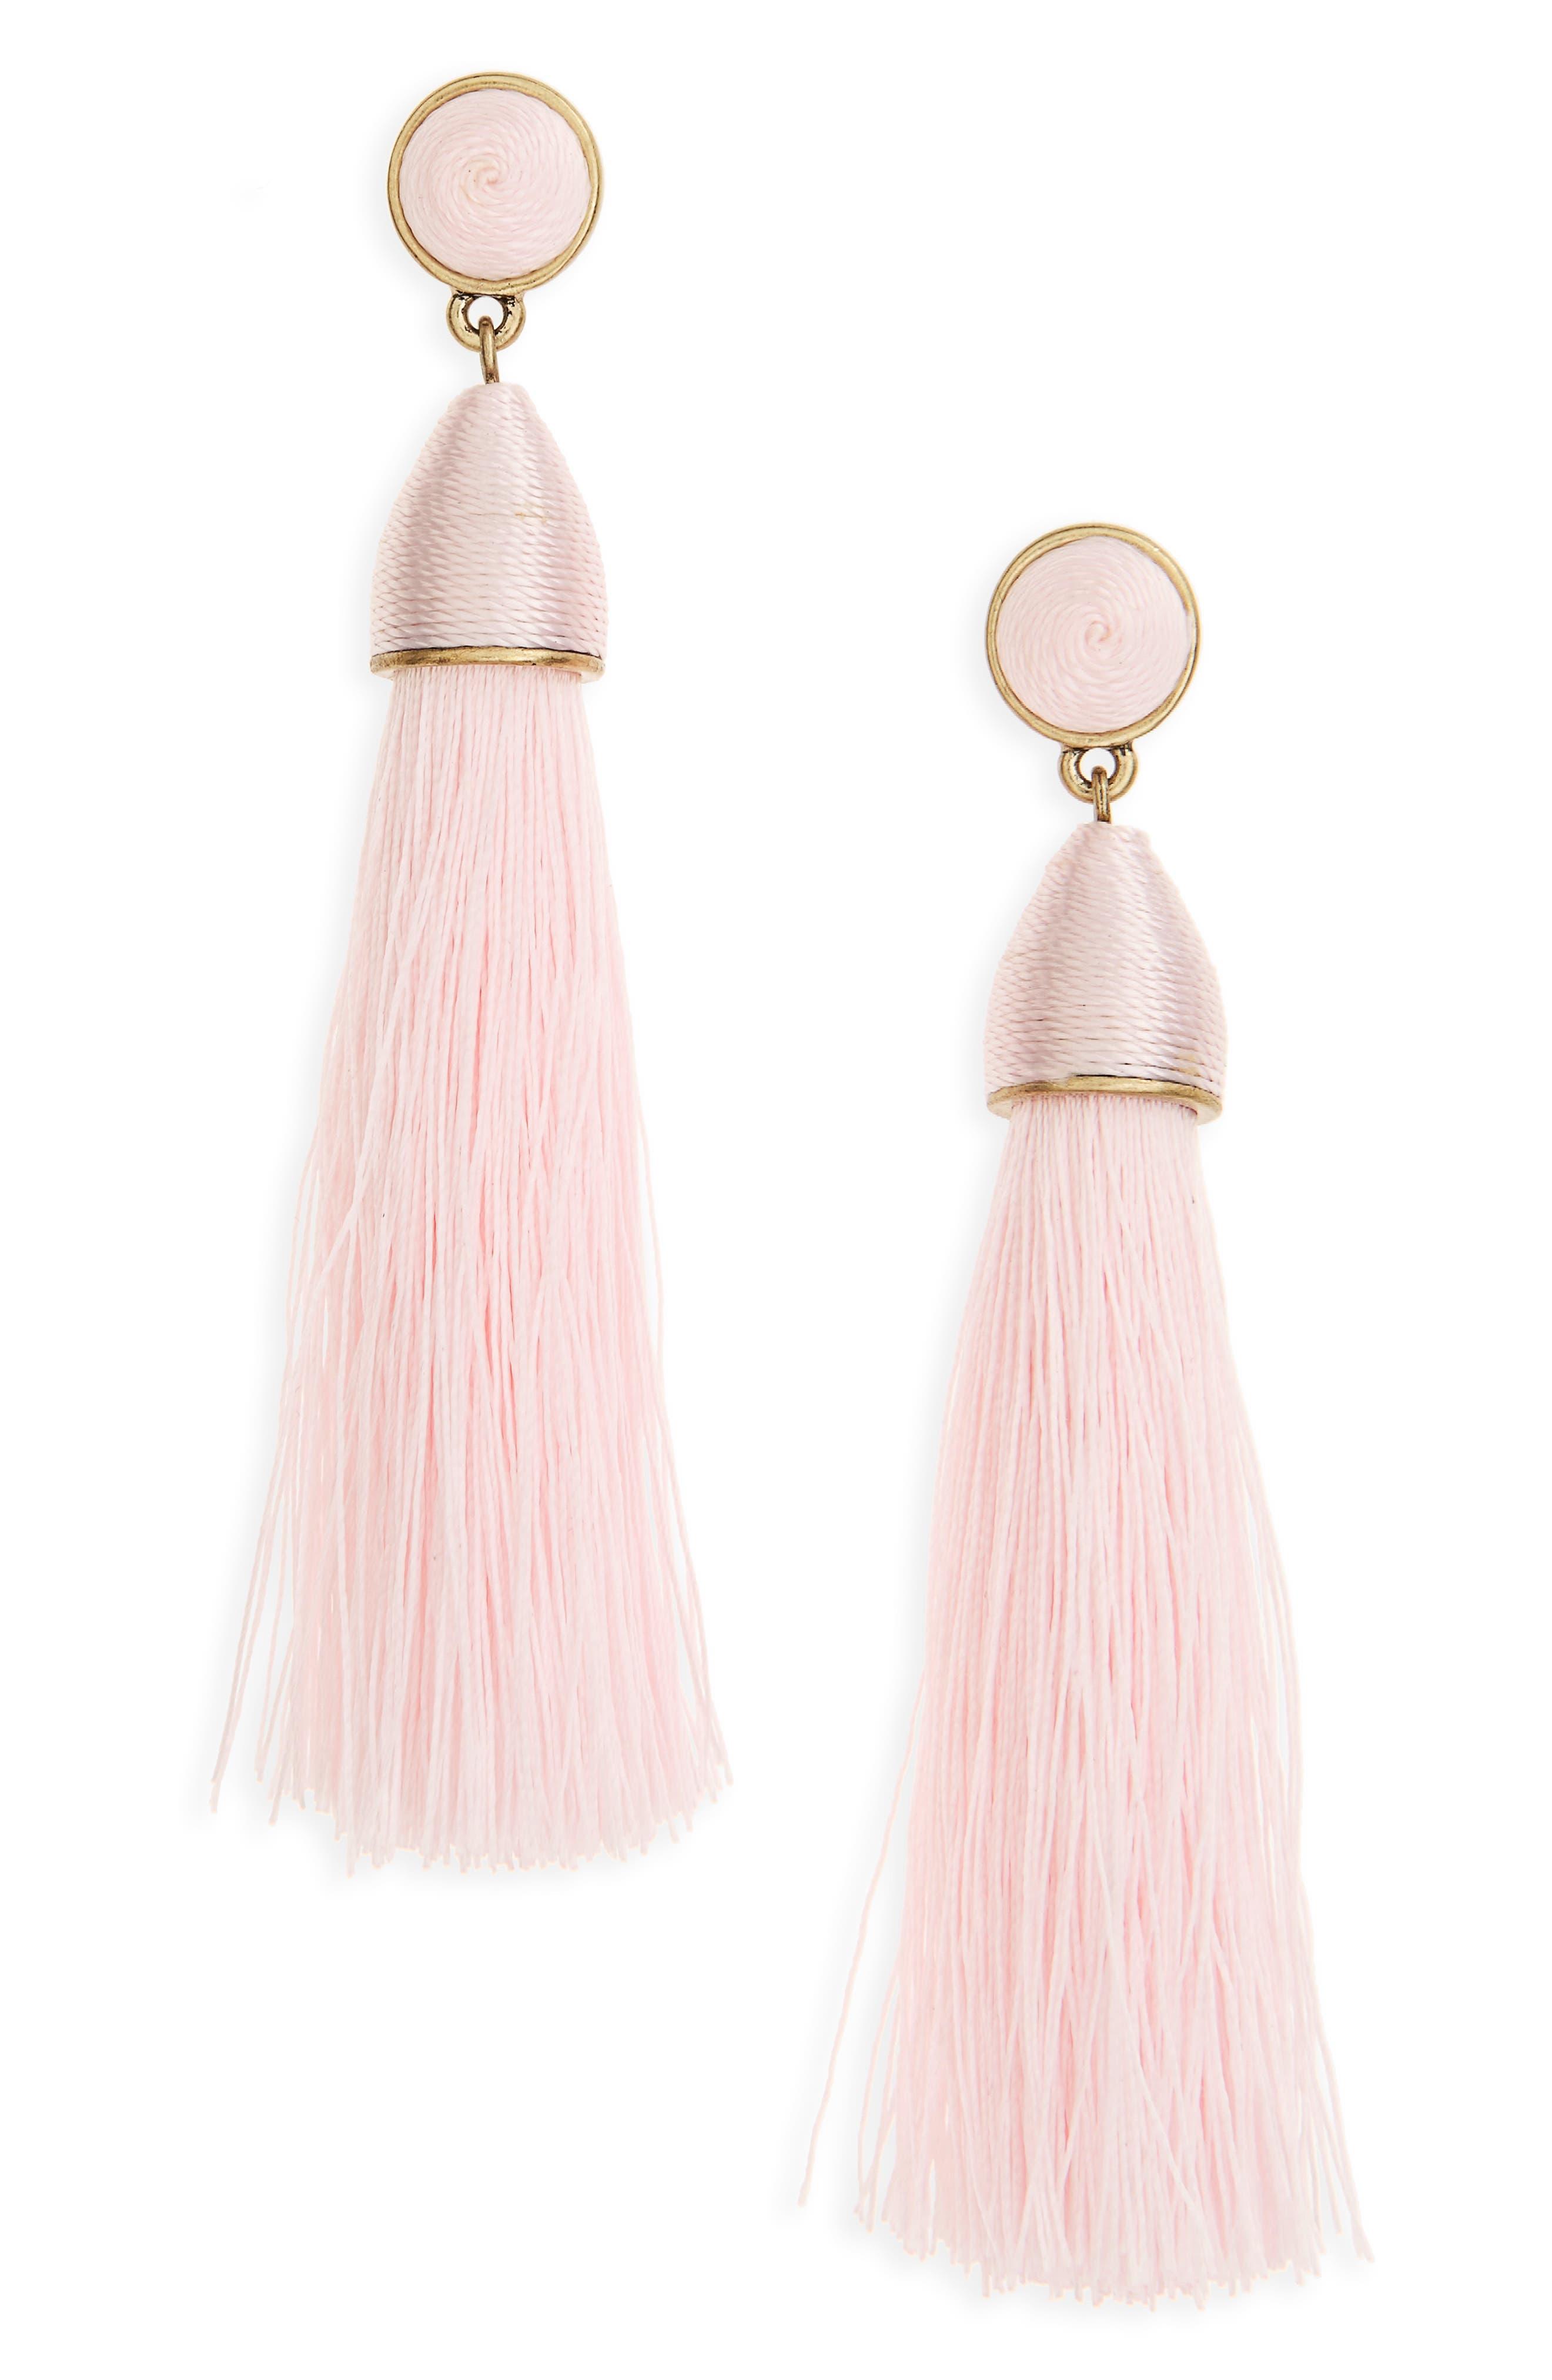 Main Image - BaubleBar Rosabella Tassel Drop Earrings